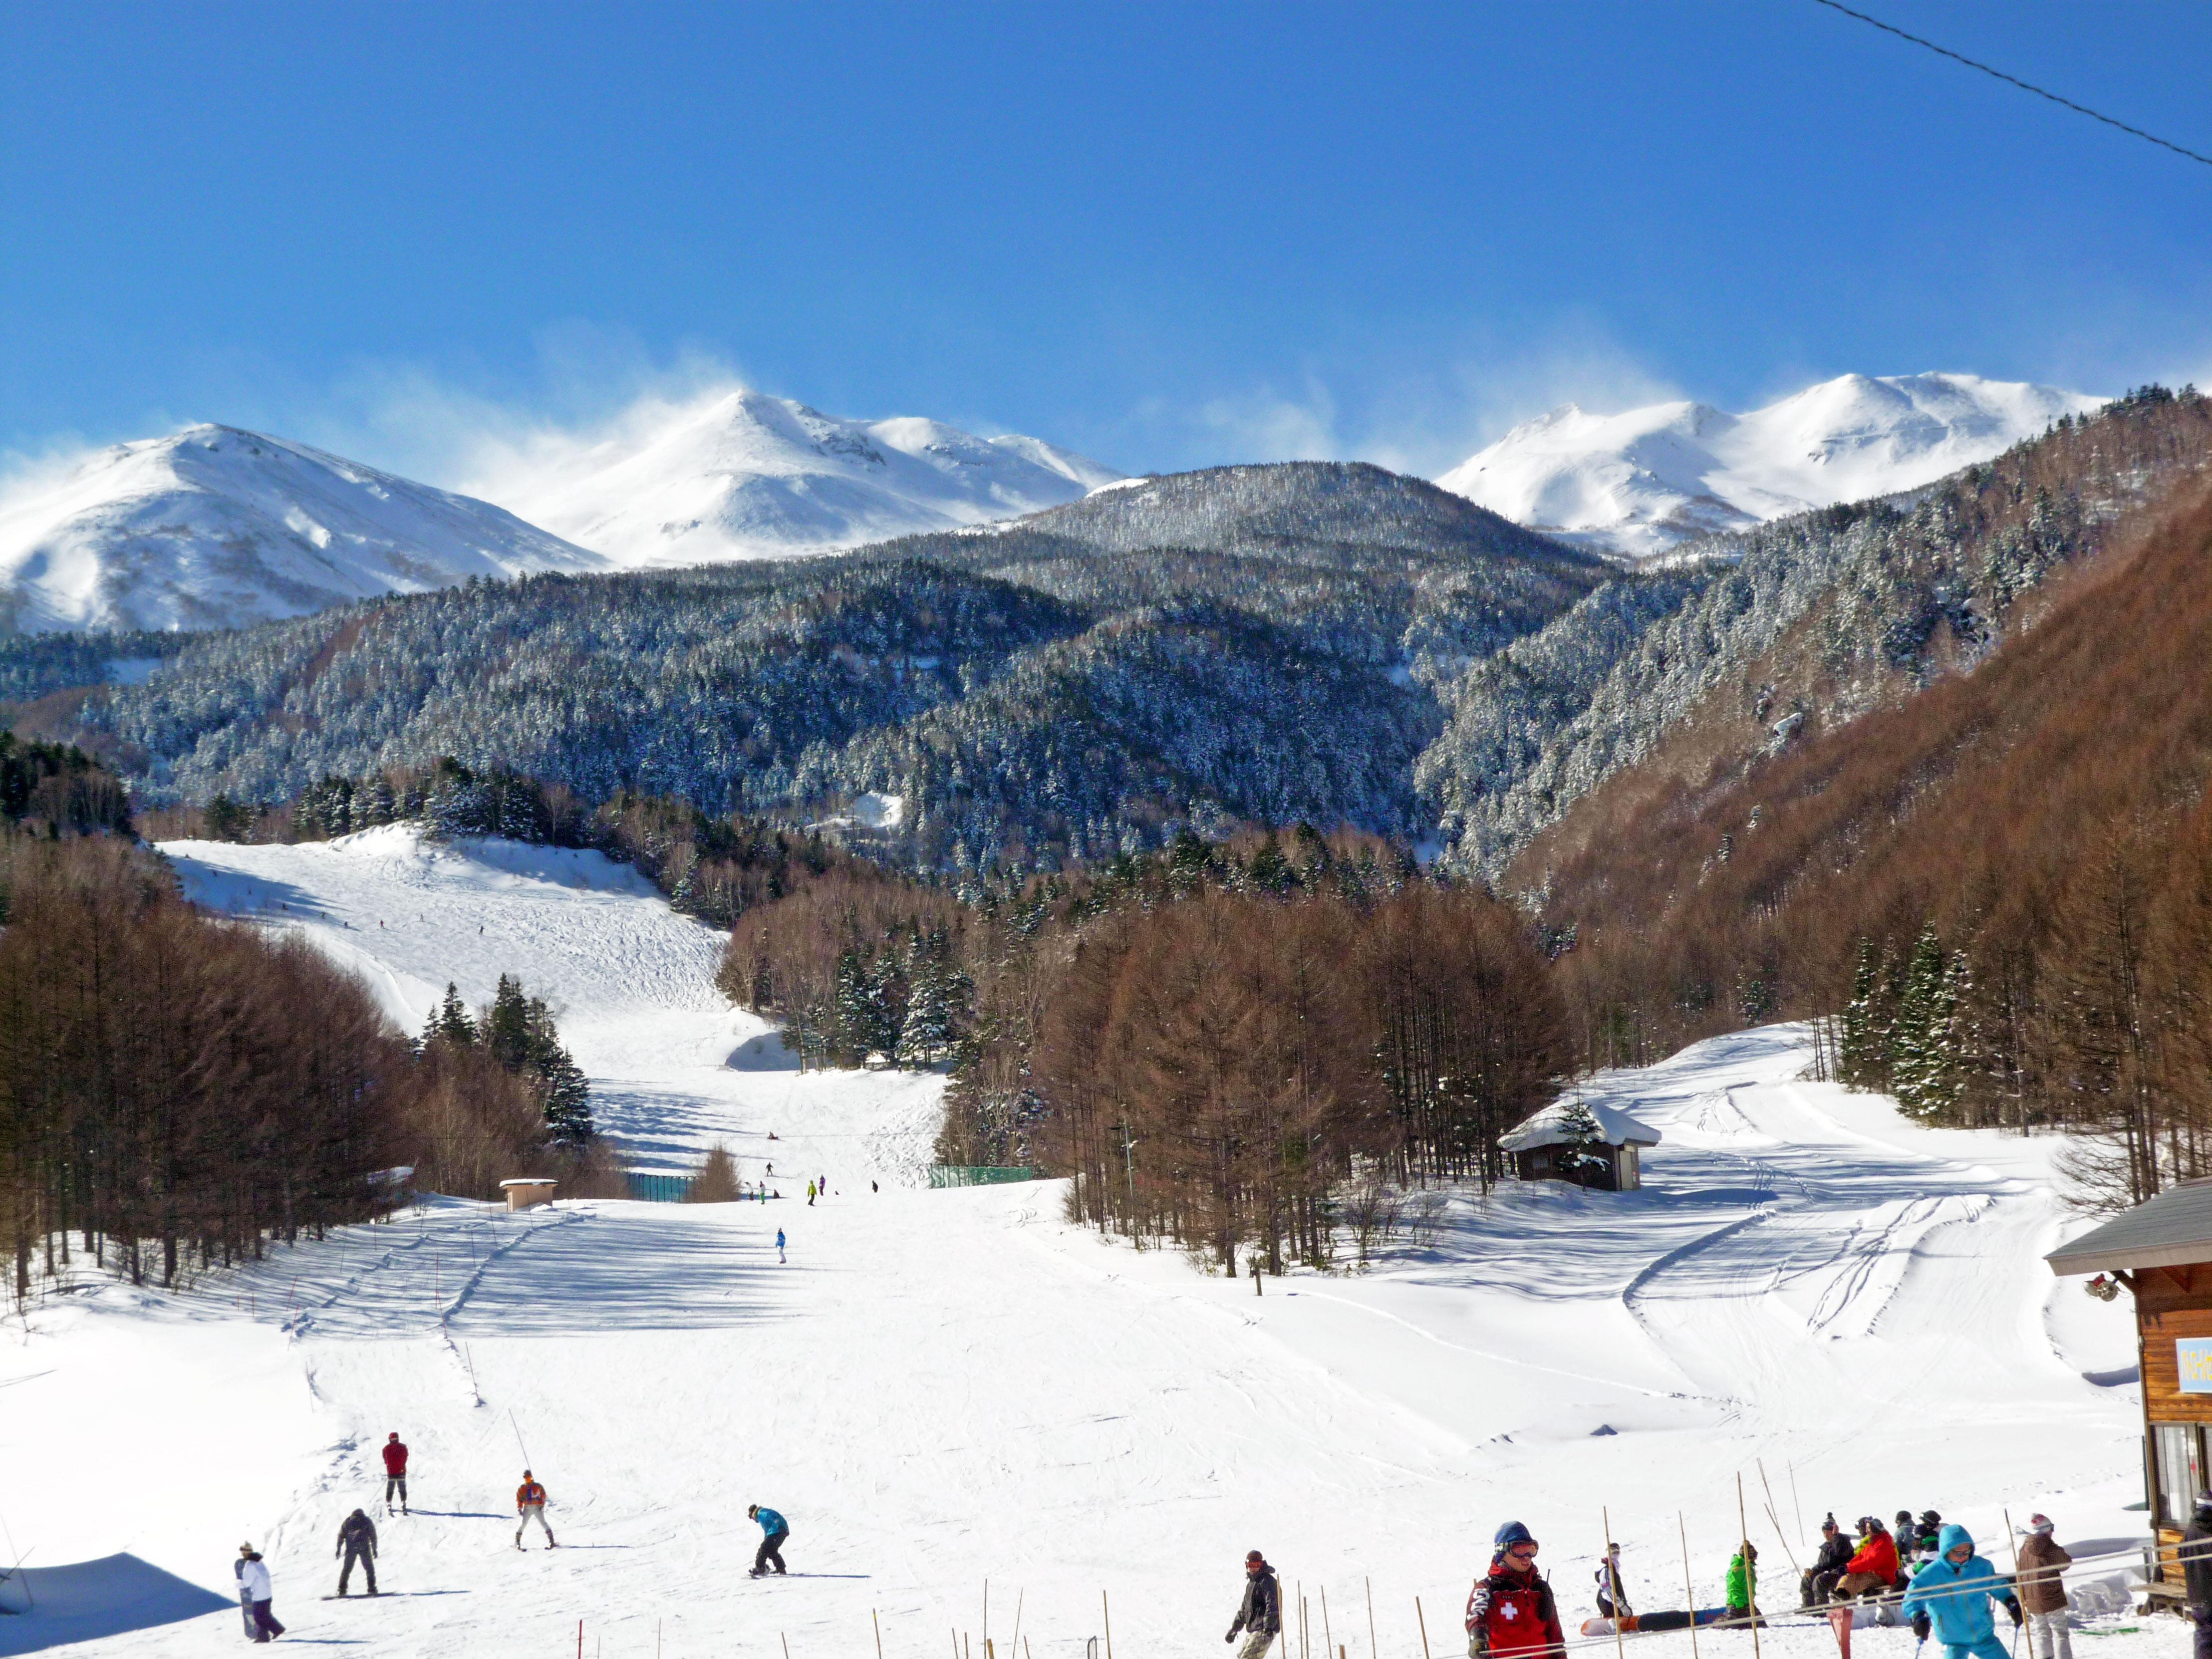 File:Norikura Kogen Snow + Spa Resort.jpg - Wikimedia Commons